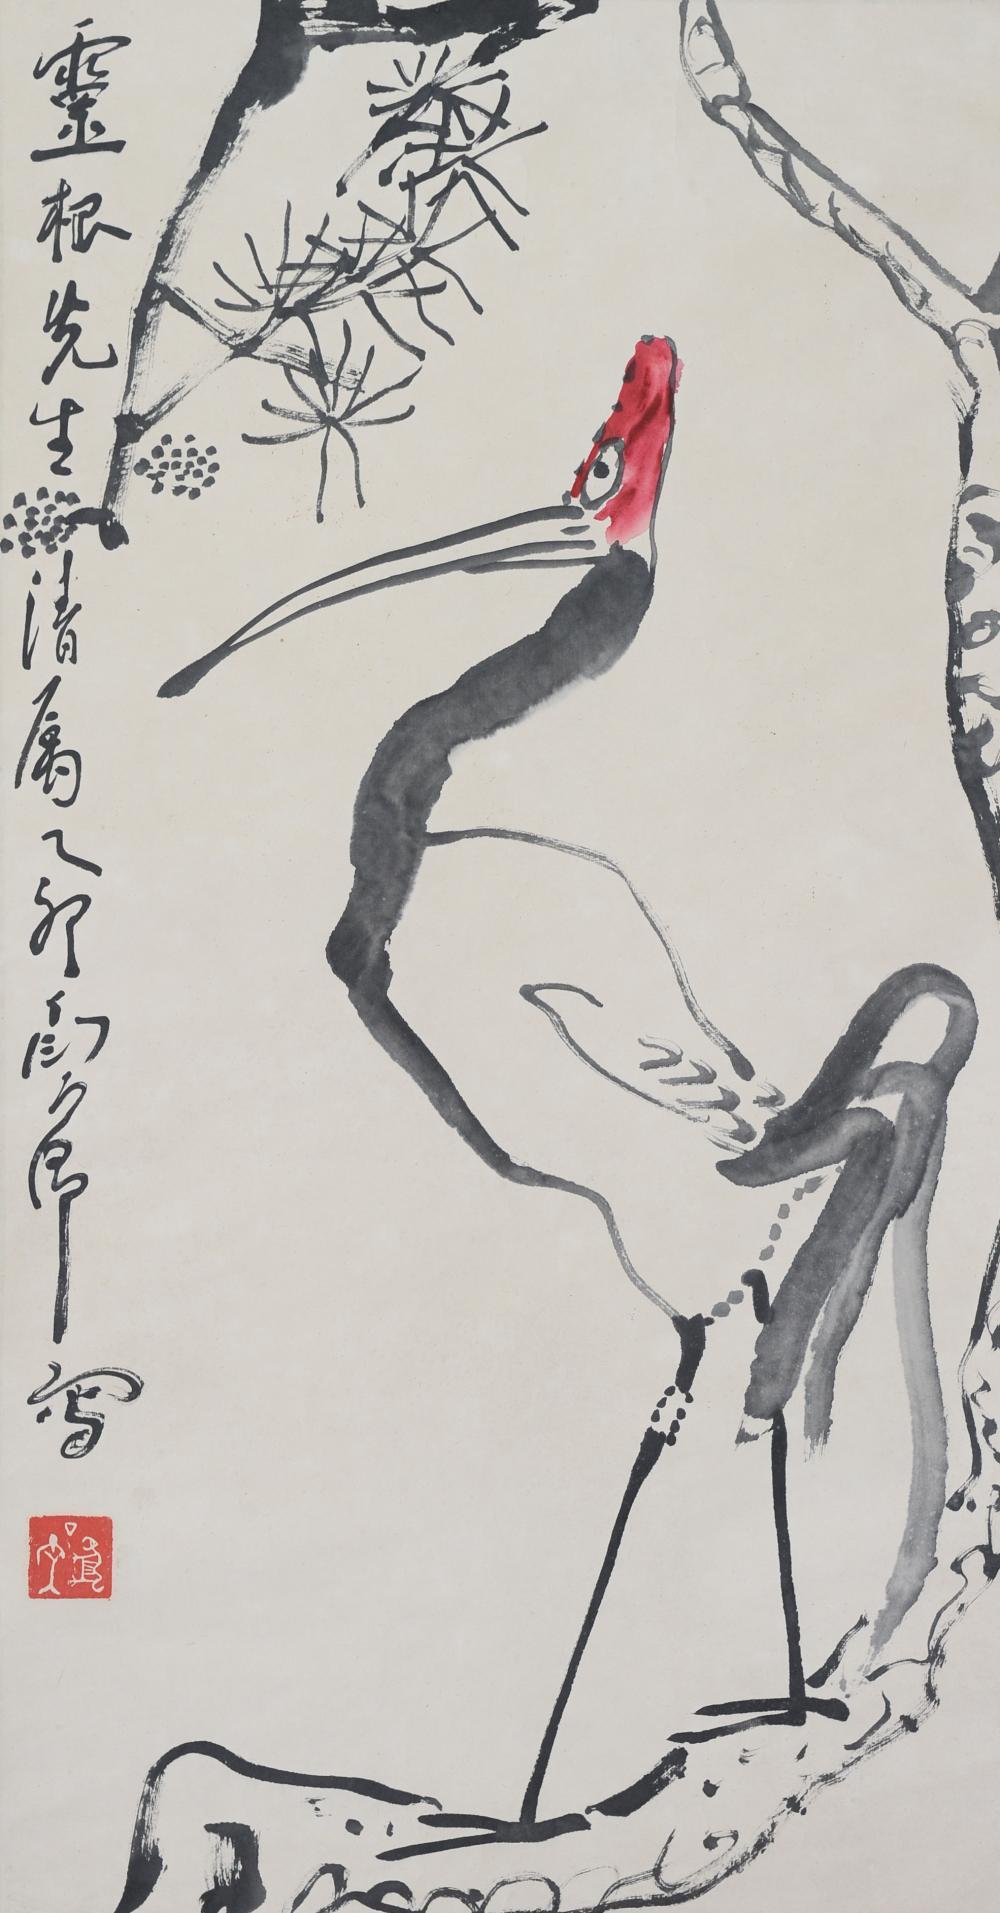 PAINTING OF CRANE, DING YANYONG (1902-1978)